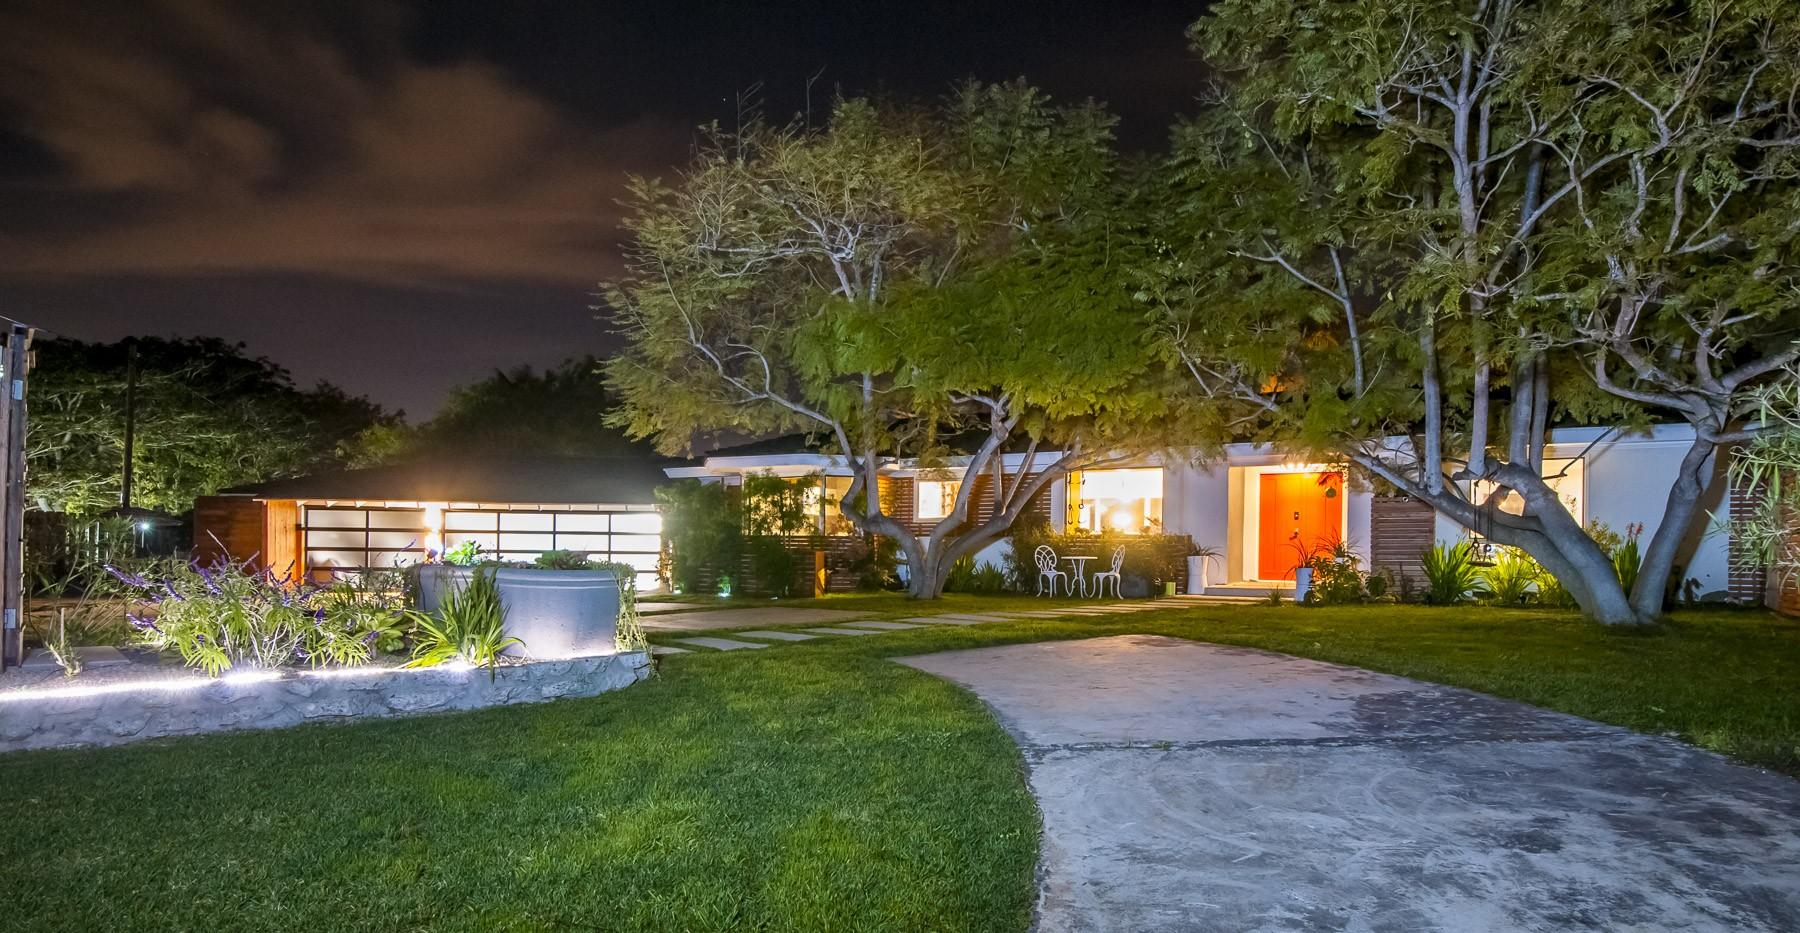 Additional photo for property listing at 8031 La Jolla Scenic  La Jolla, California 92037 United States